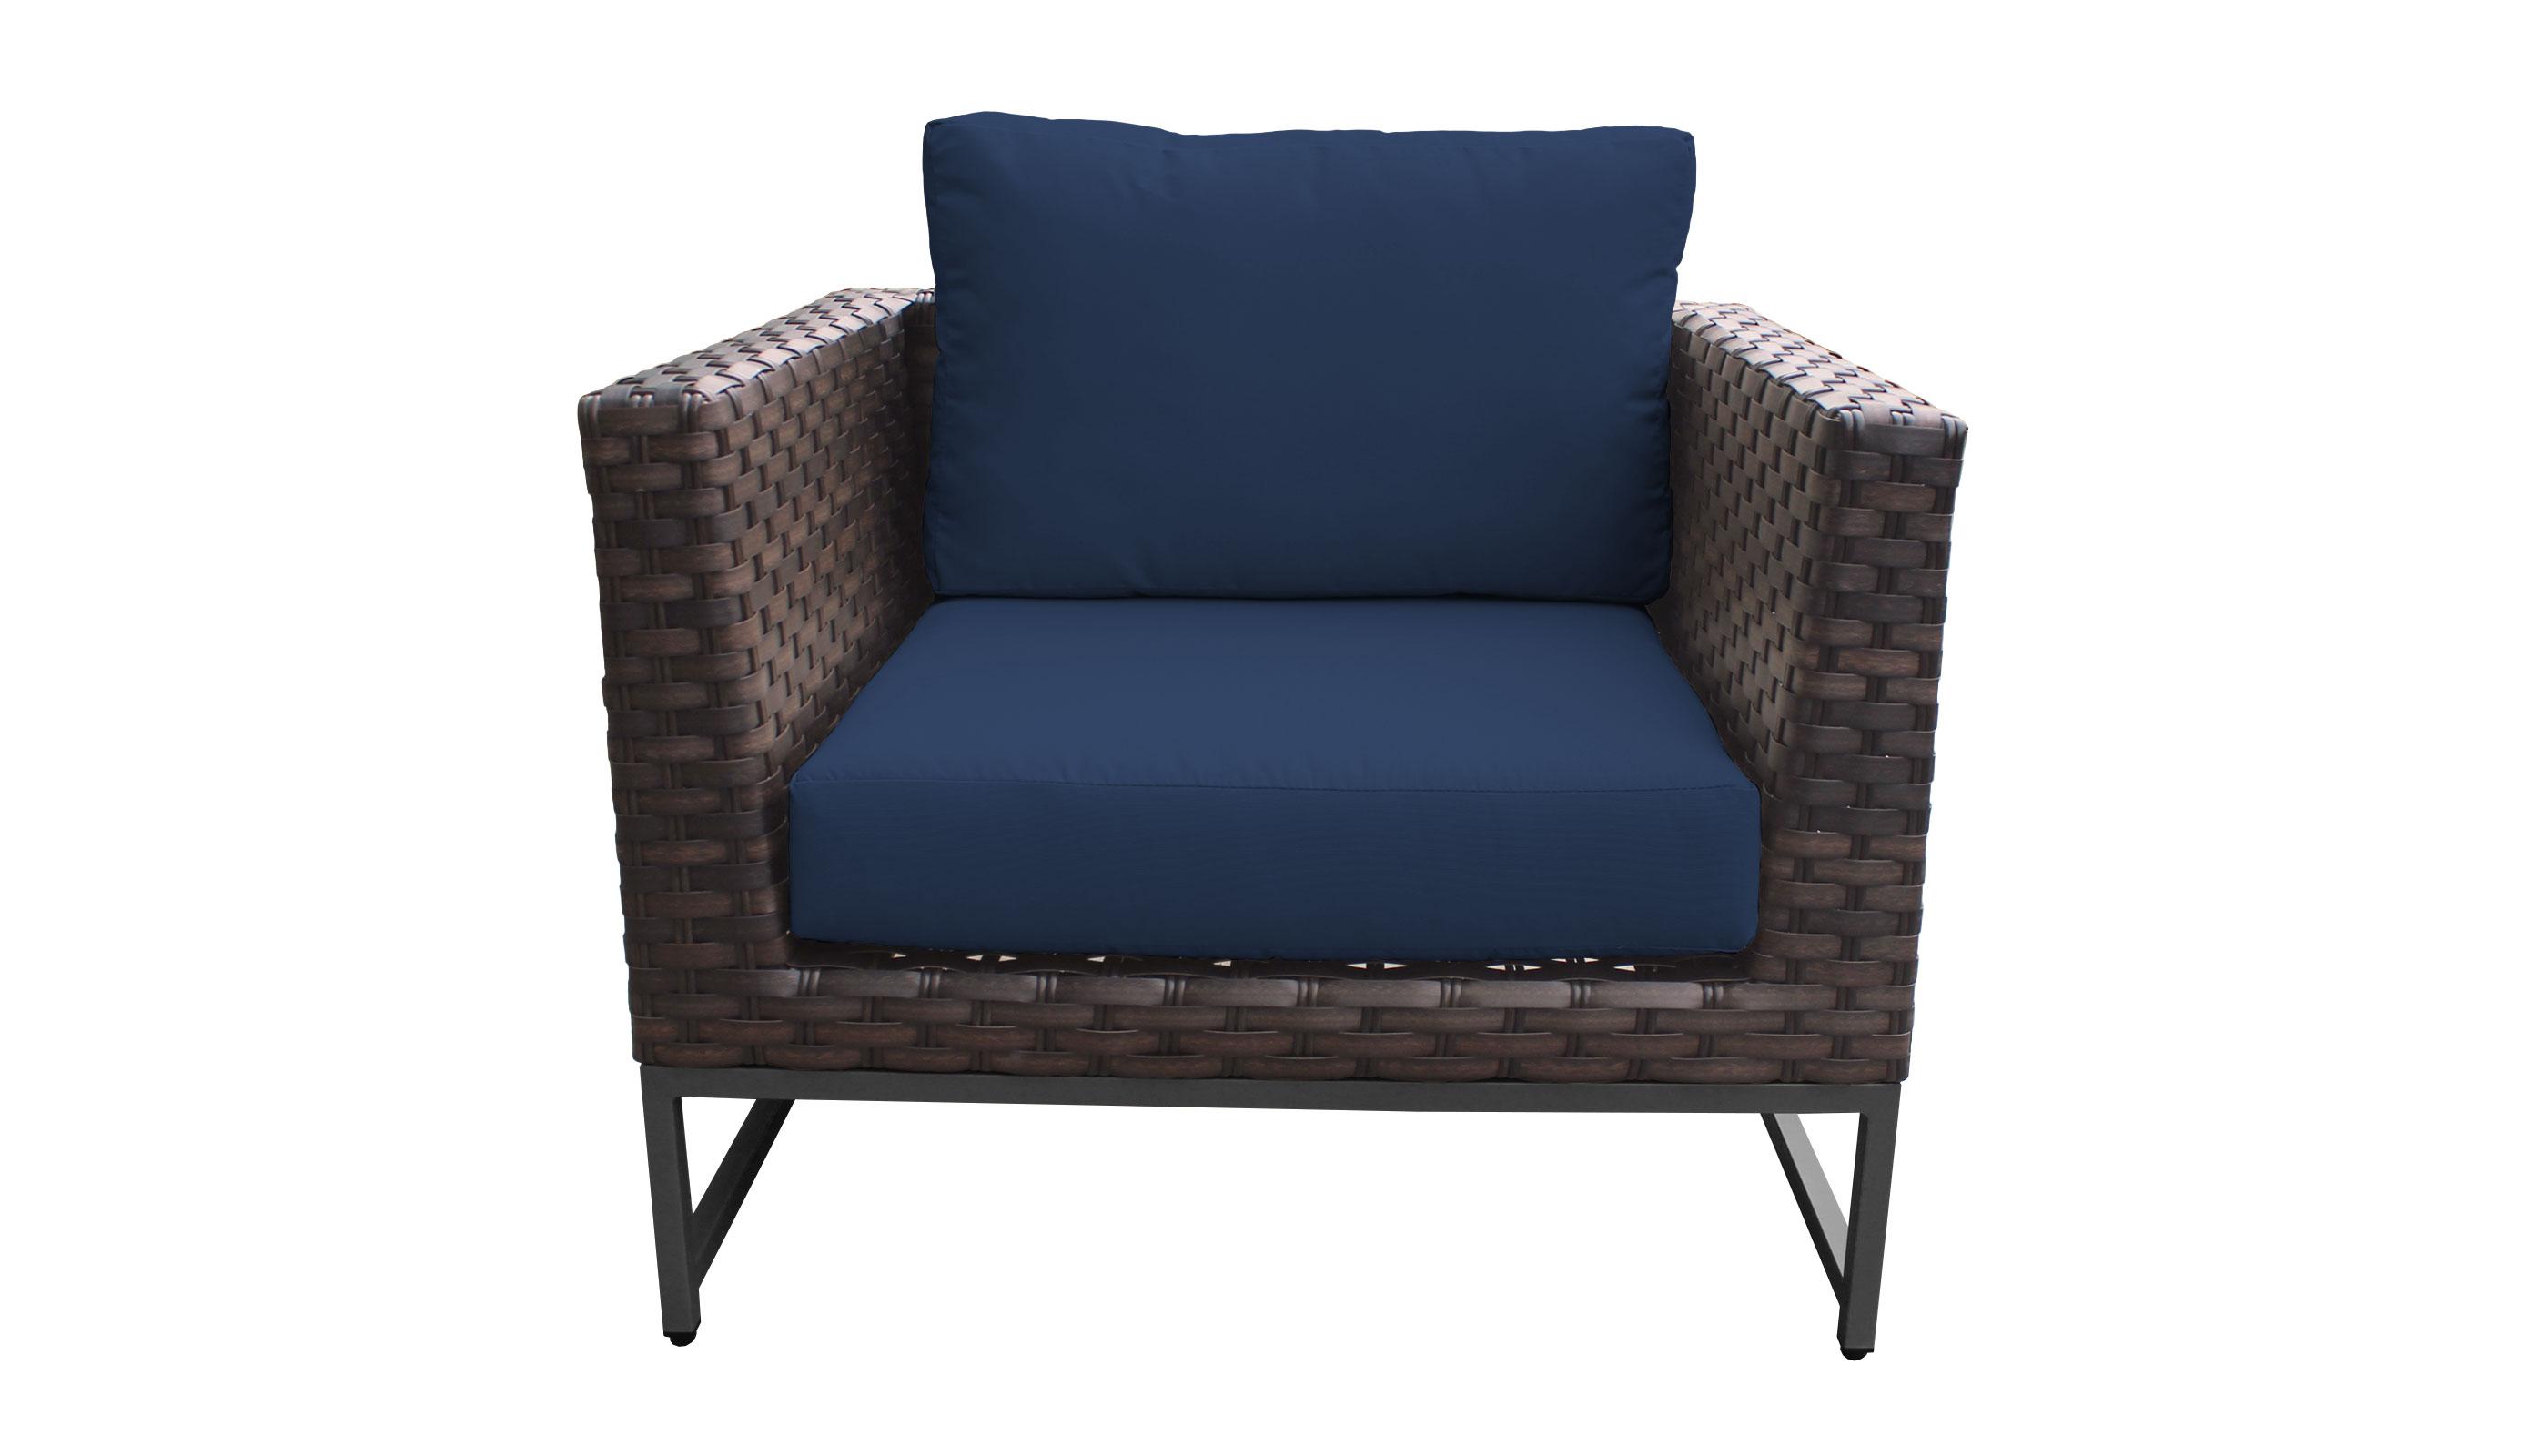 Barcelona 3 Piece Outdoor Wicker Patio Furniture Set 03a - TK Classics